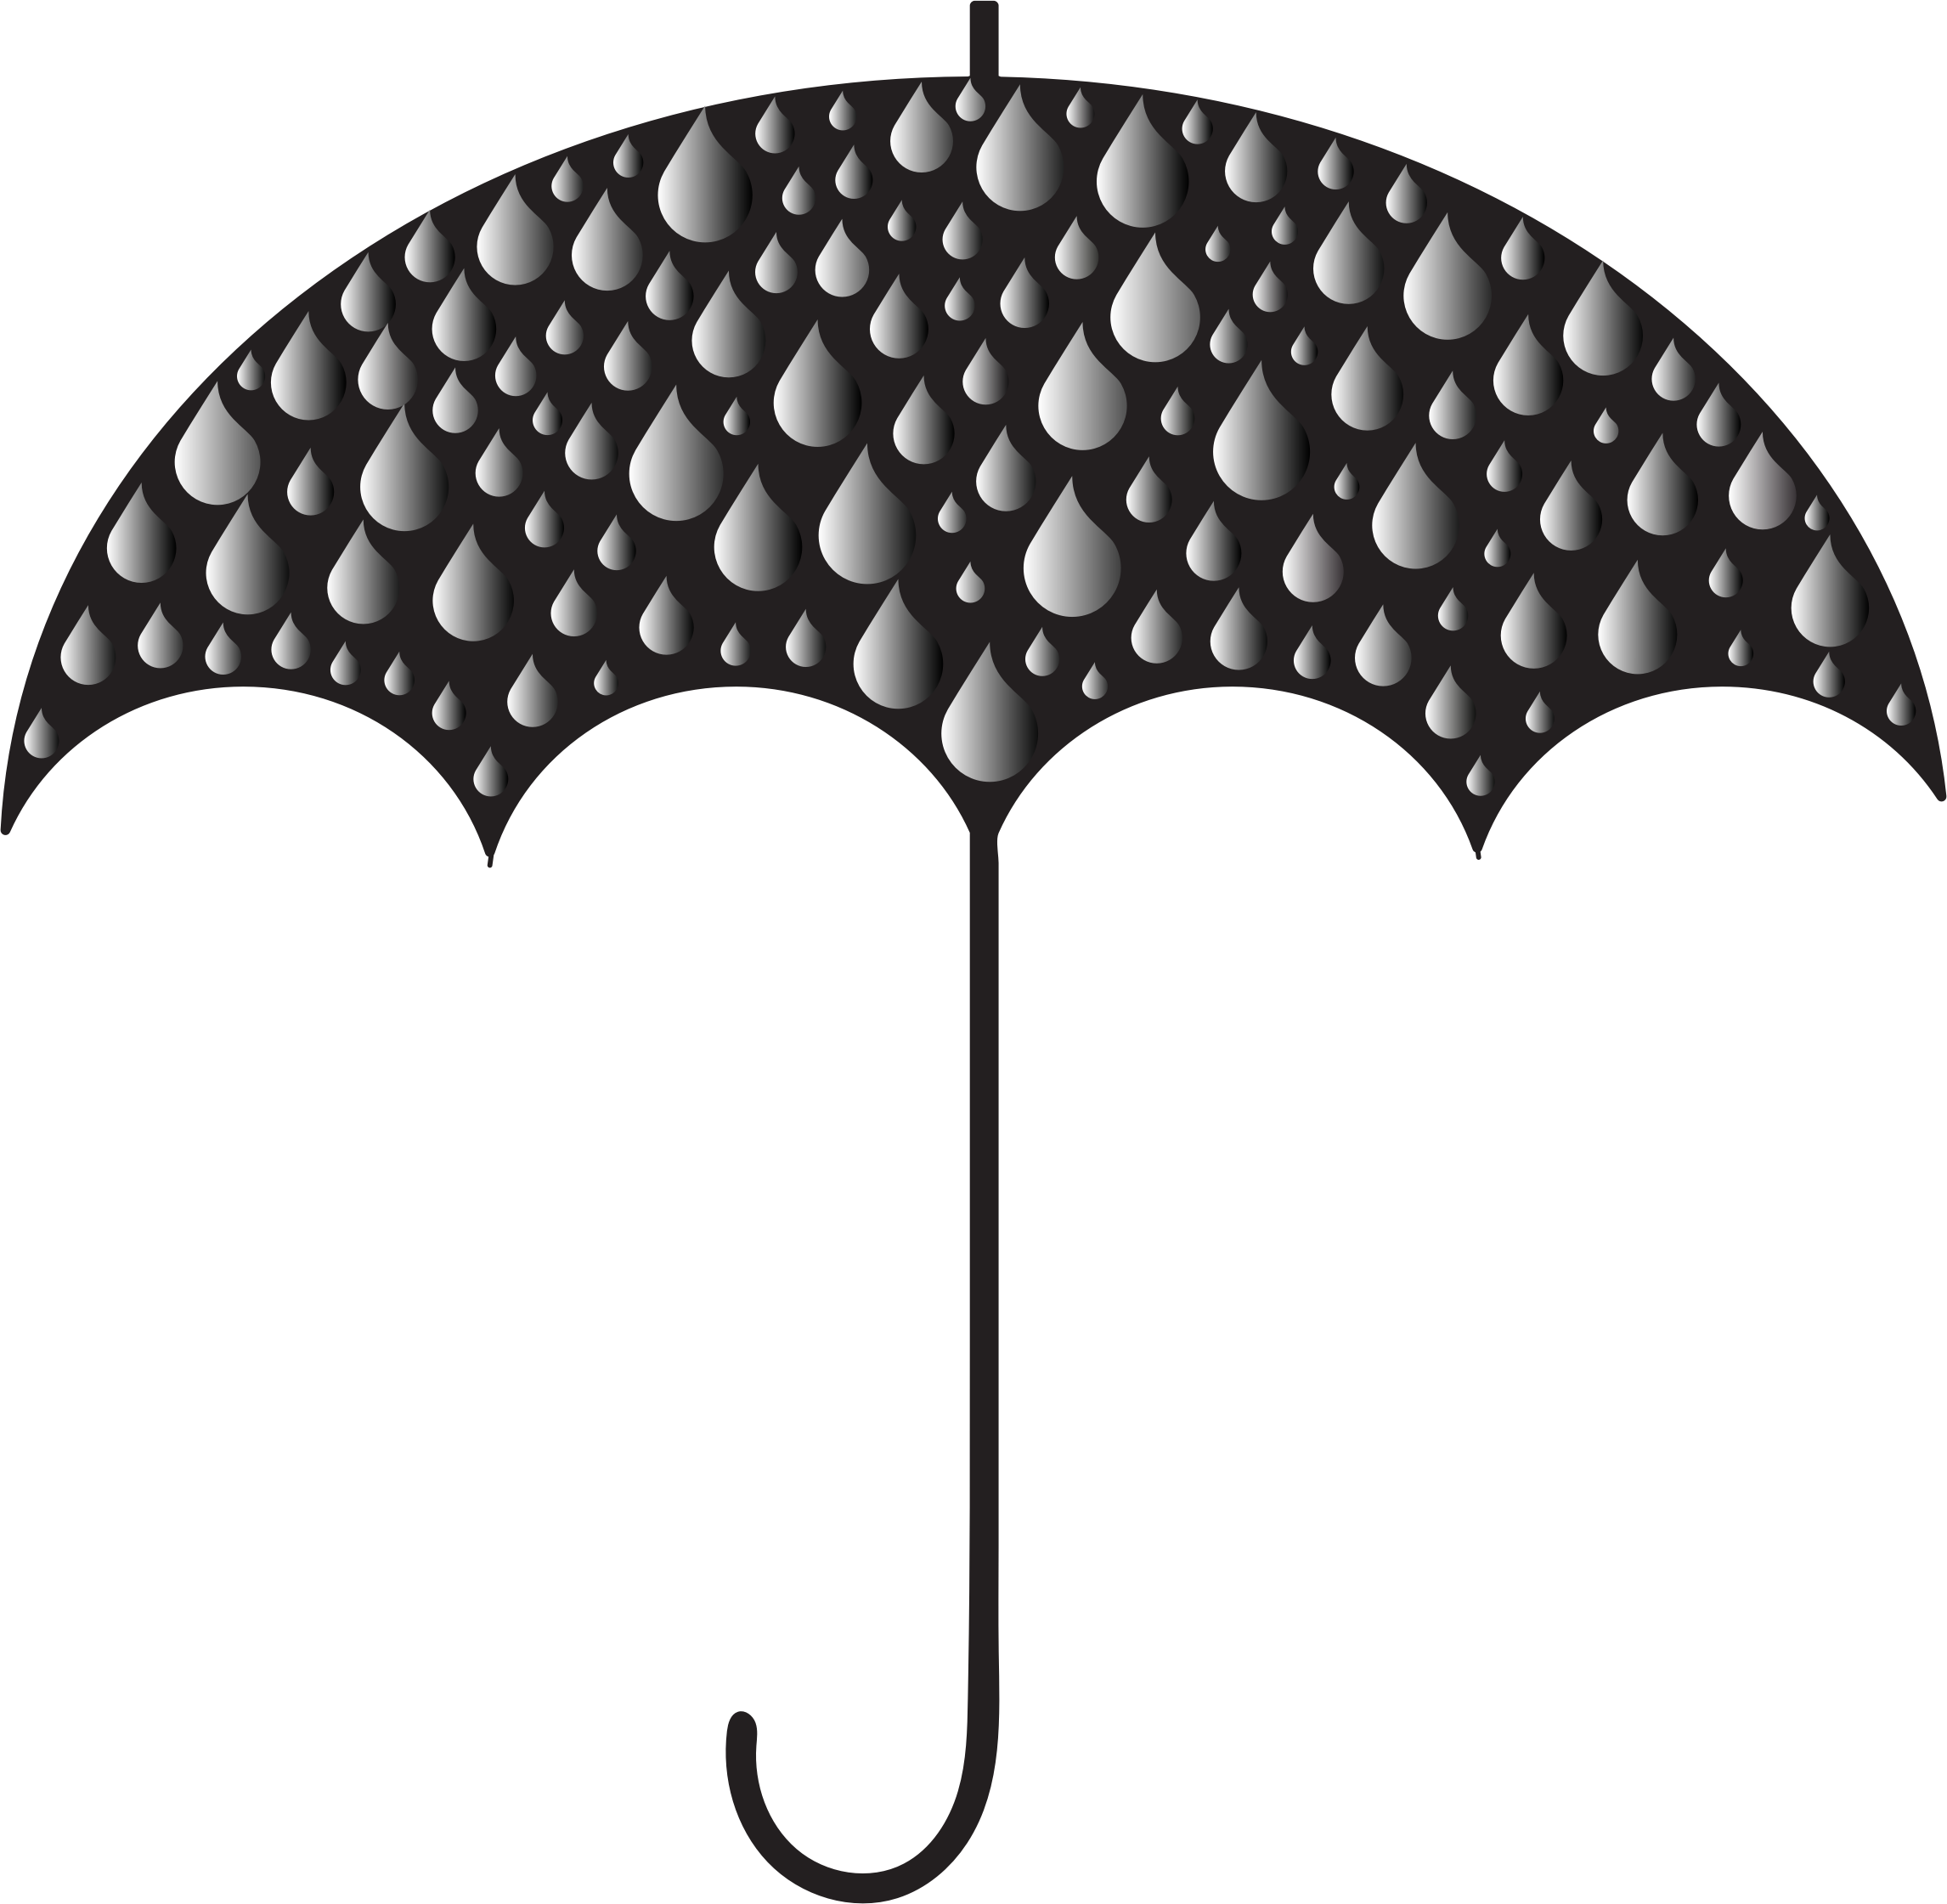 Clipart umbrella rainy clothes. Prismatic rain drops silhouette